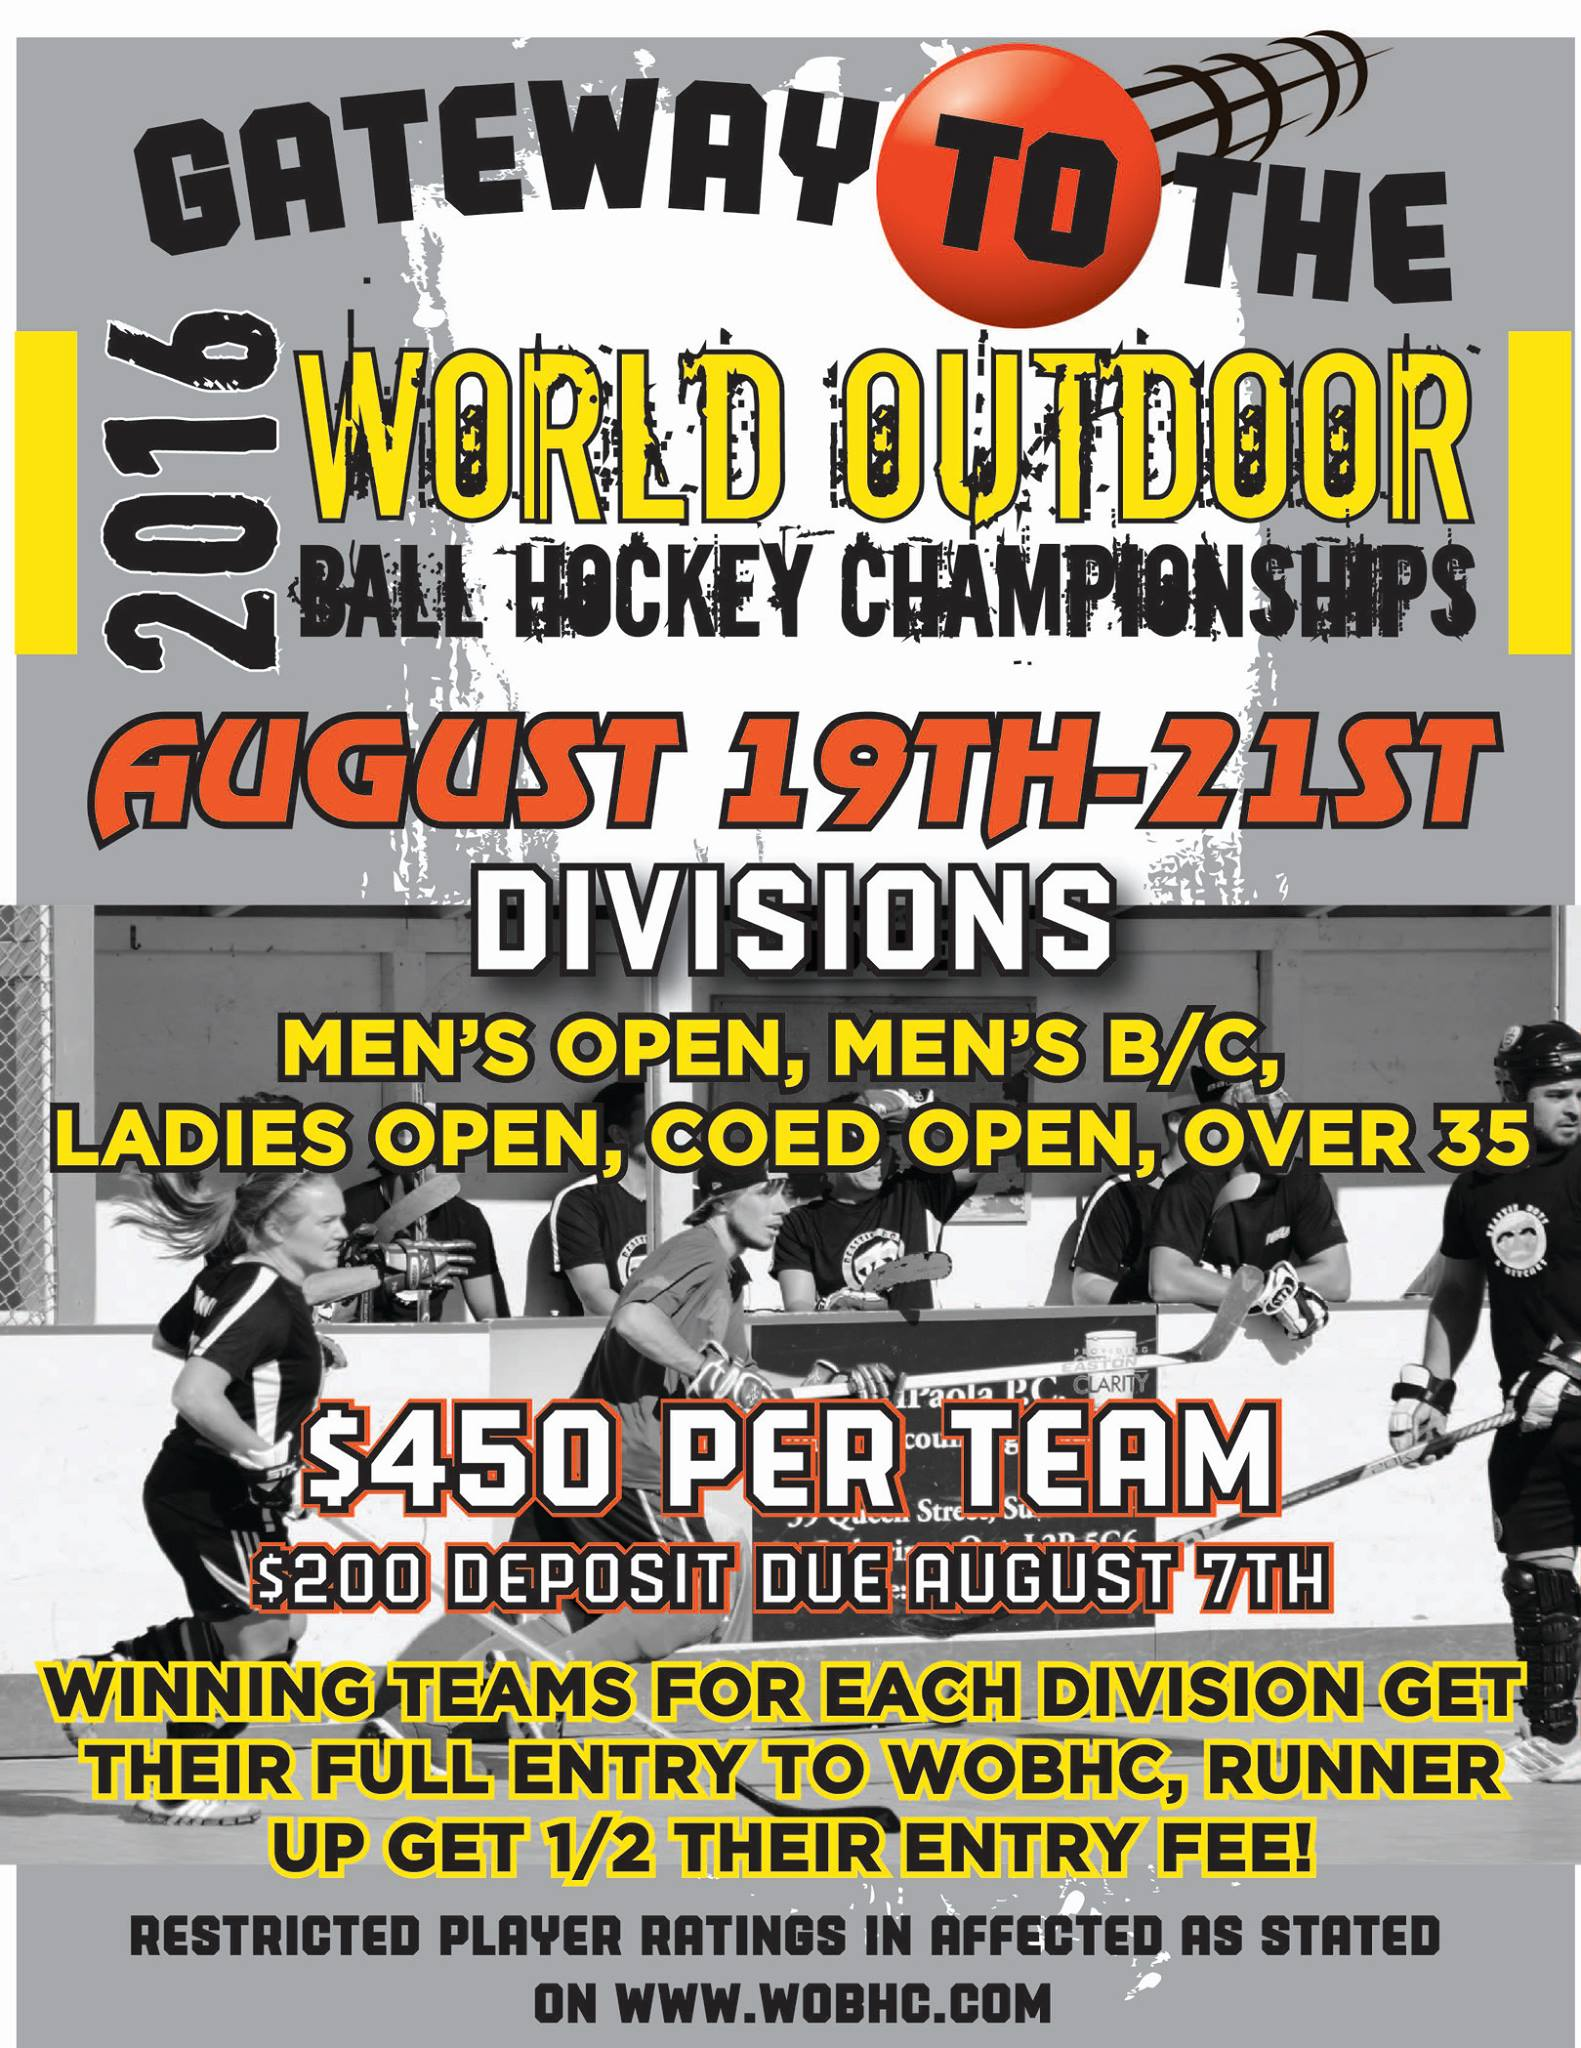 Latest News Ballhockey Com